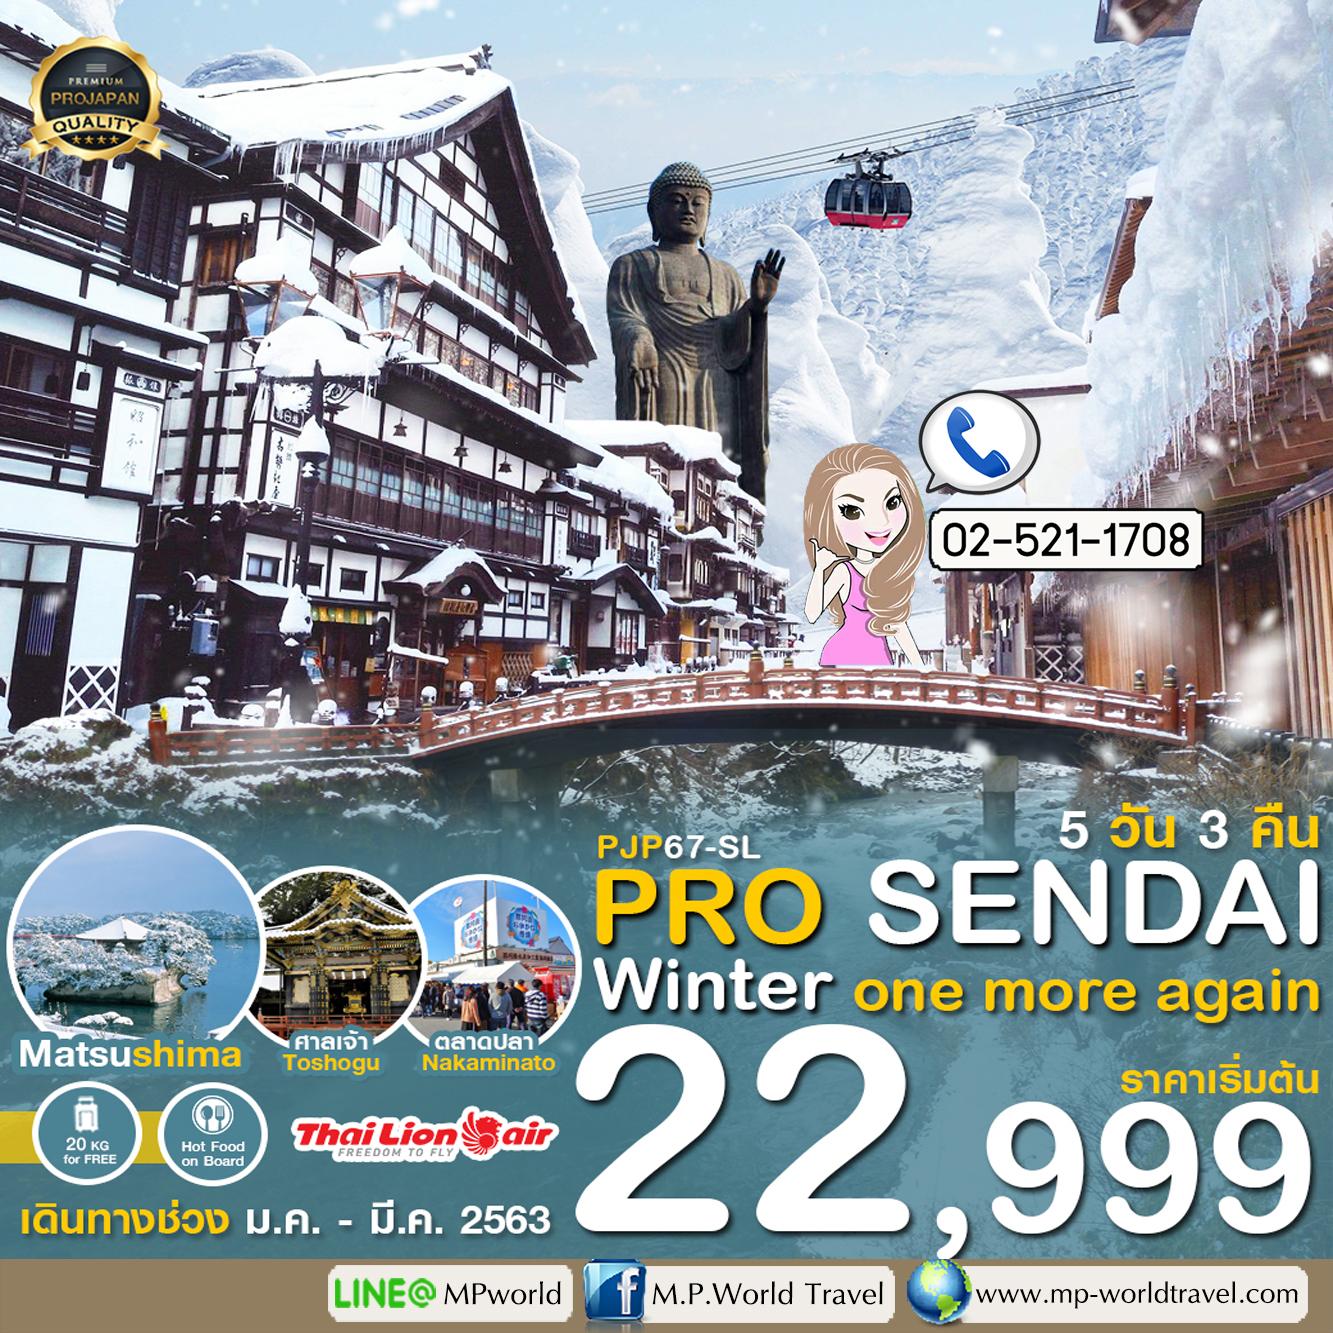 PJP67 ทัวร์ญี่ปุ่น PRO SENDAI ONE MORE AGAIN 5D 3N SL